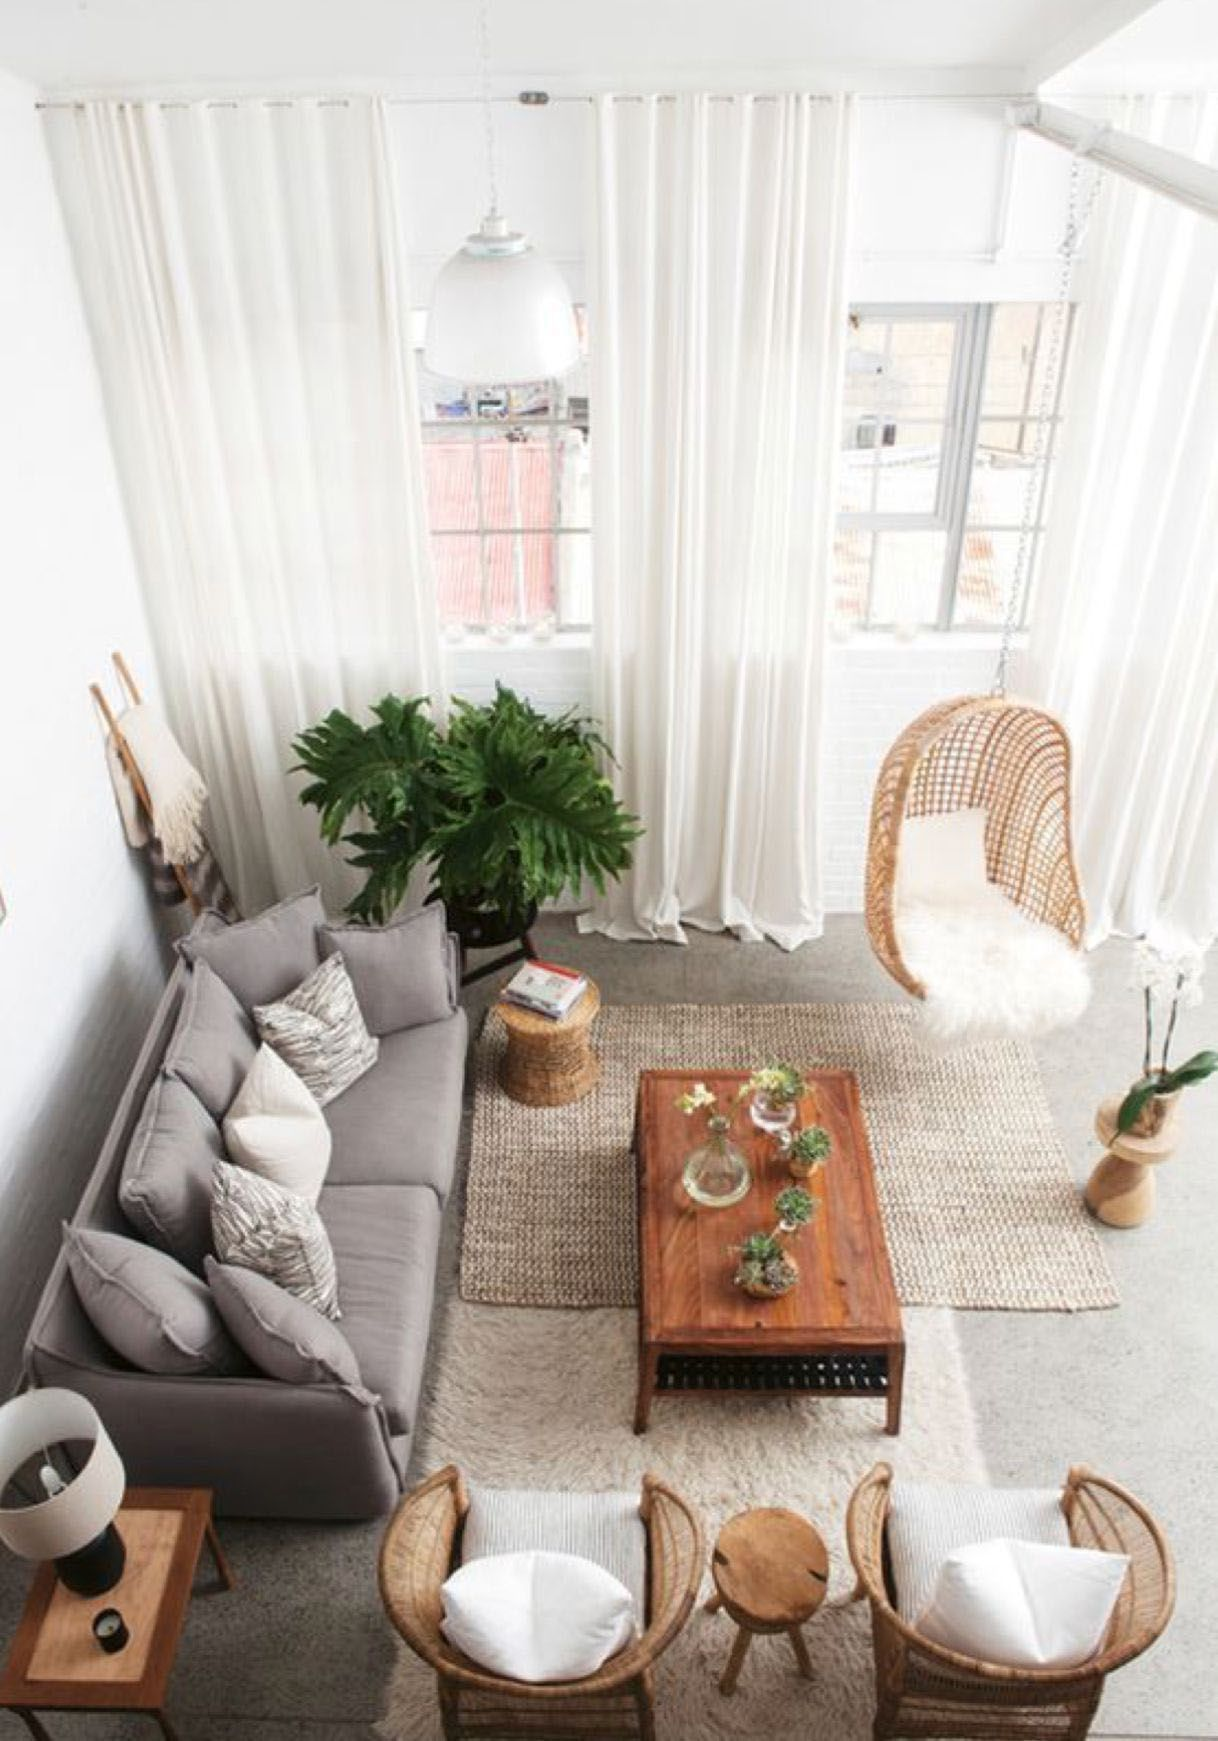 Living Room Chairs Uk 2020 In 2020 Summer Living Room Decor Living Room Diy Livingroom Layout